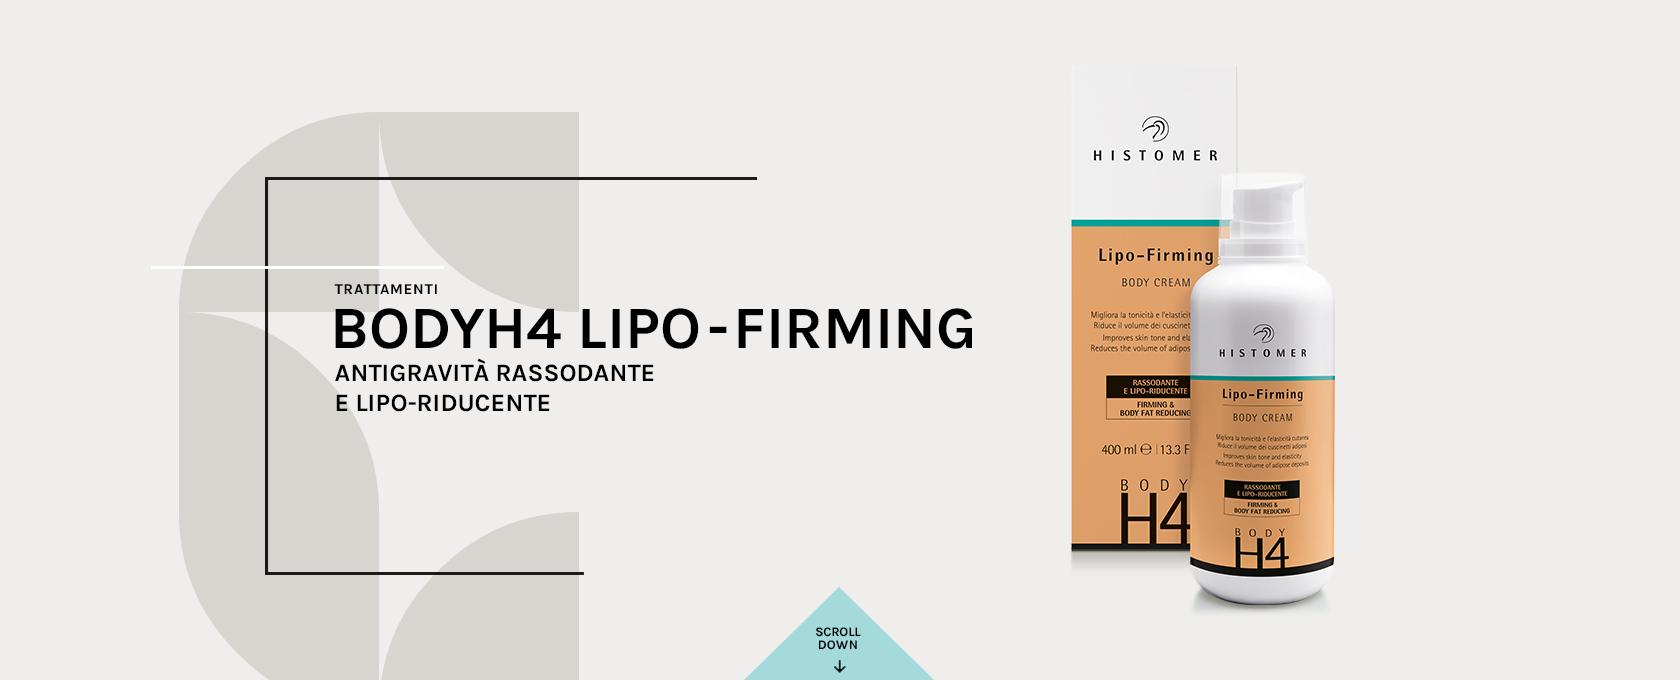 Body h4 Lipo Firming body cream